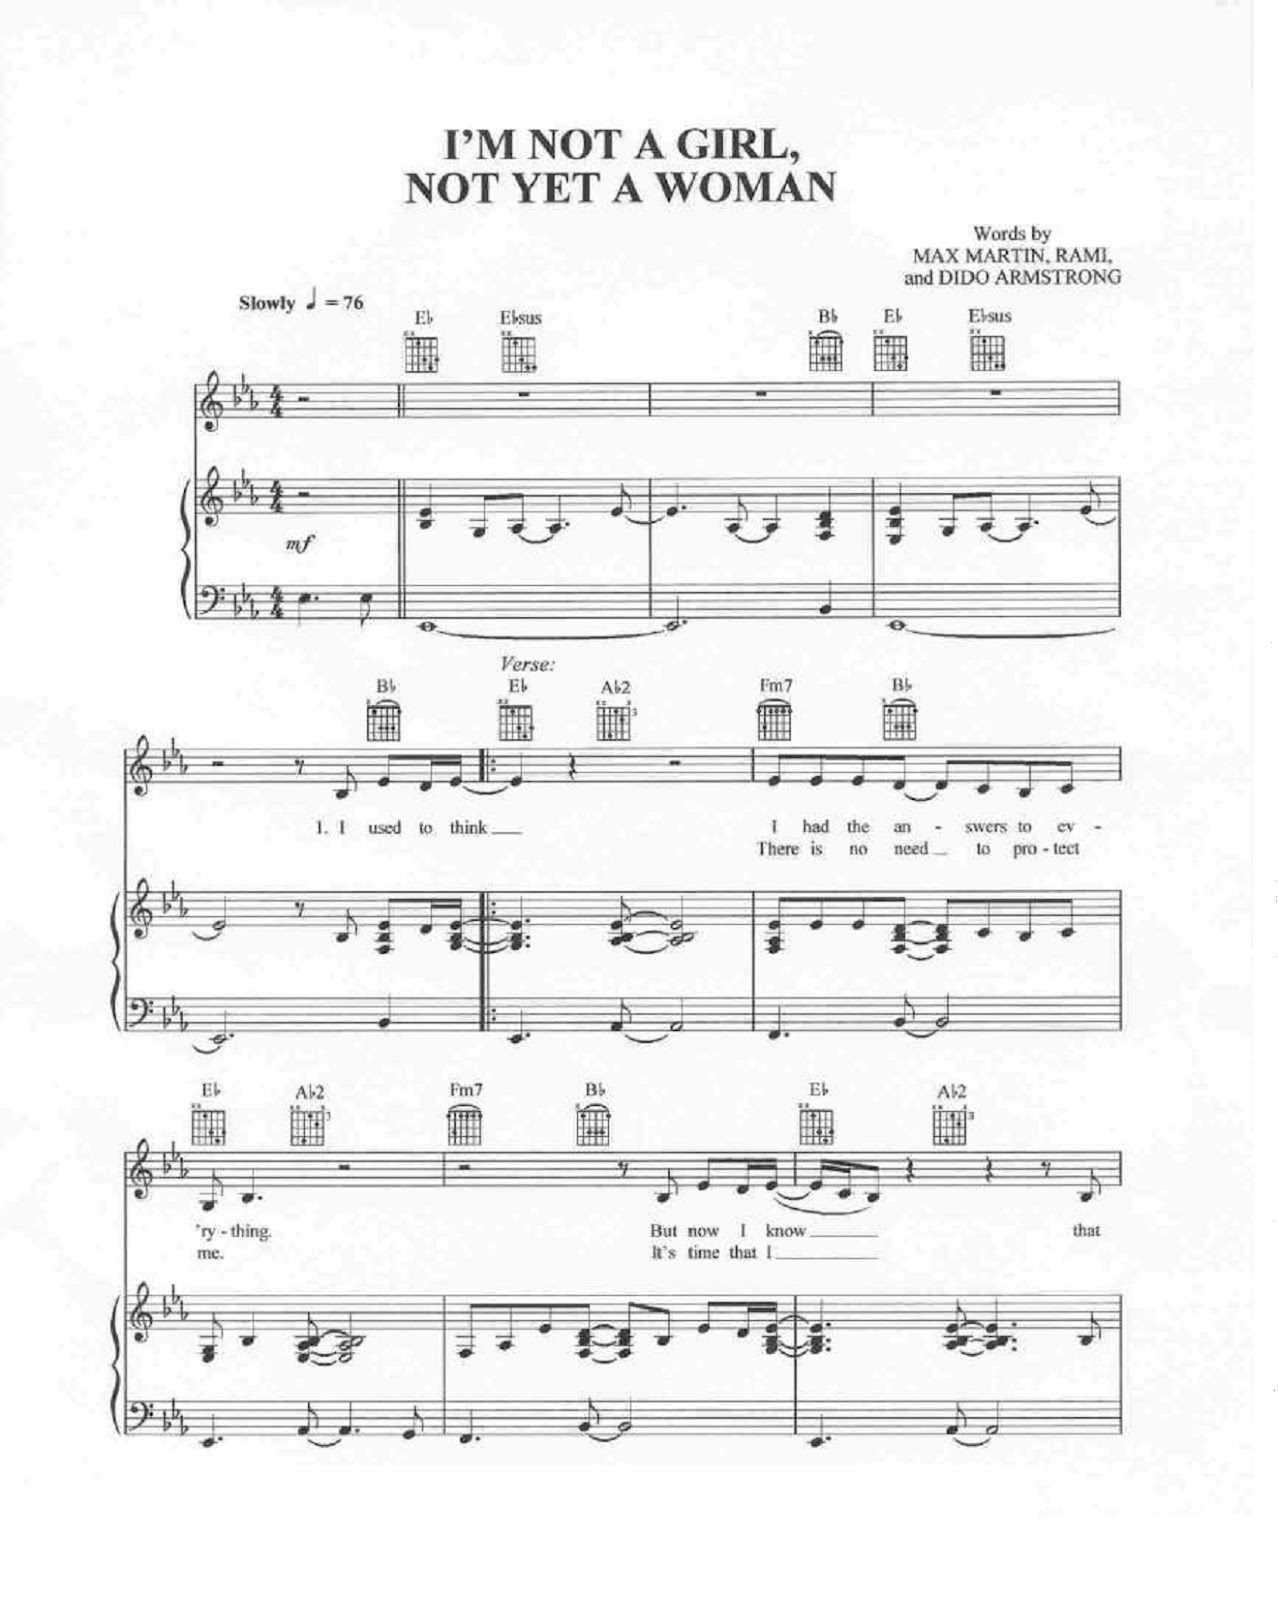 http://4.bp.blogspot.com/-QN-LLVDfxHU/T0j5lUDU6YI/AAAAAAAACPg/F4YoOw1ZRHs/s1600/im+not+a+girl+not+yet+a+woman+britney+spears+p1.jpg